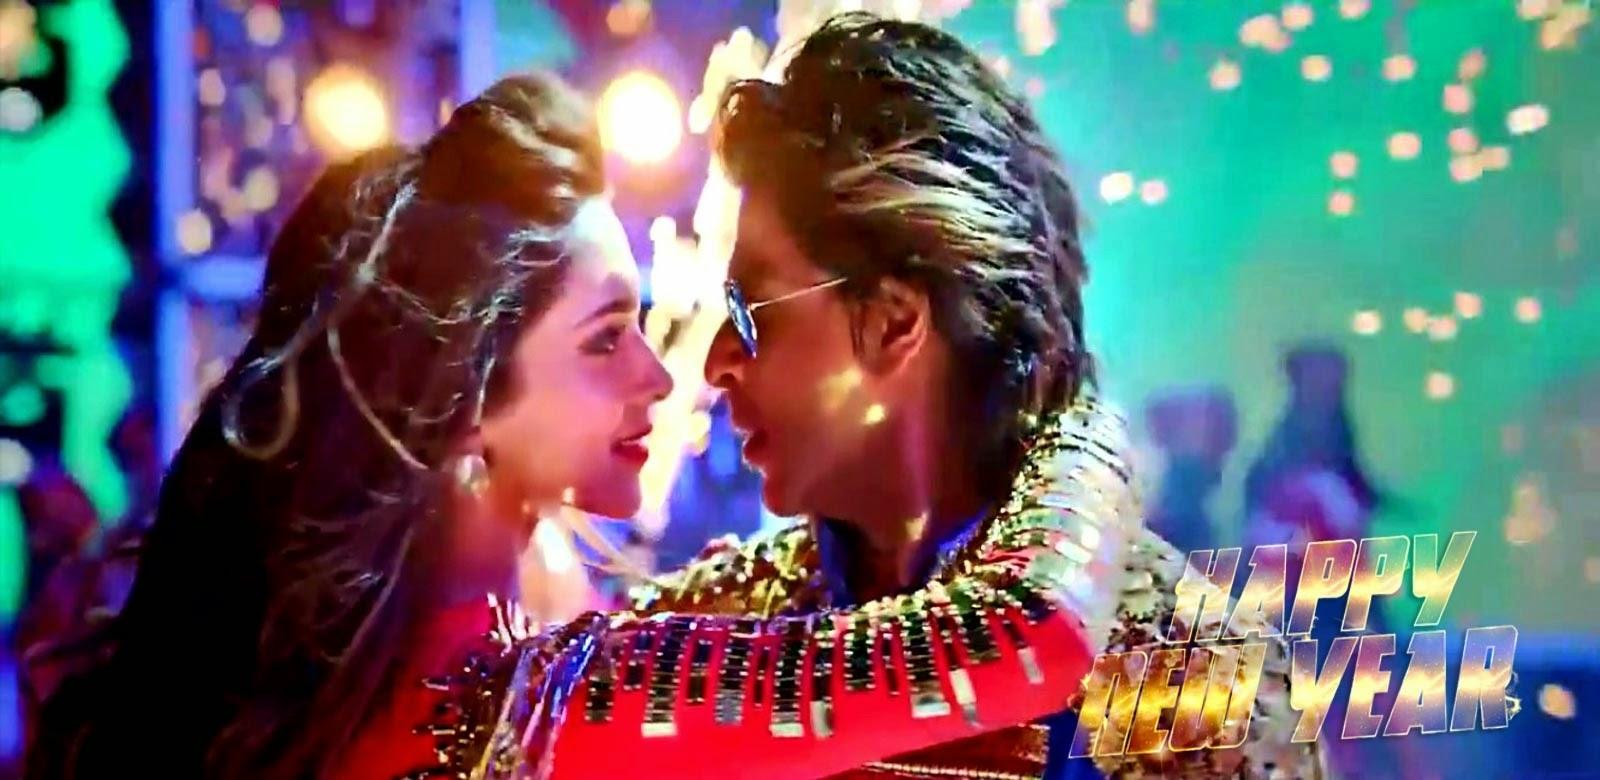 Movie happy new year dipika padu with sharukh khan romentic 2014 (Actor and Actress Hd Wallpaper)